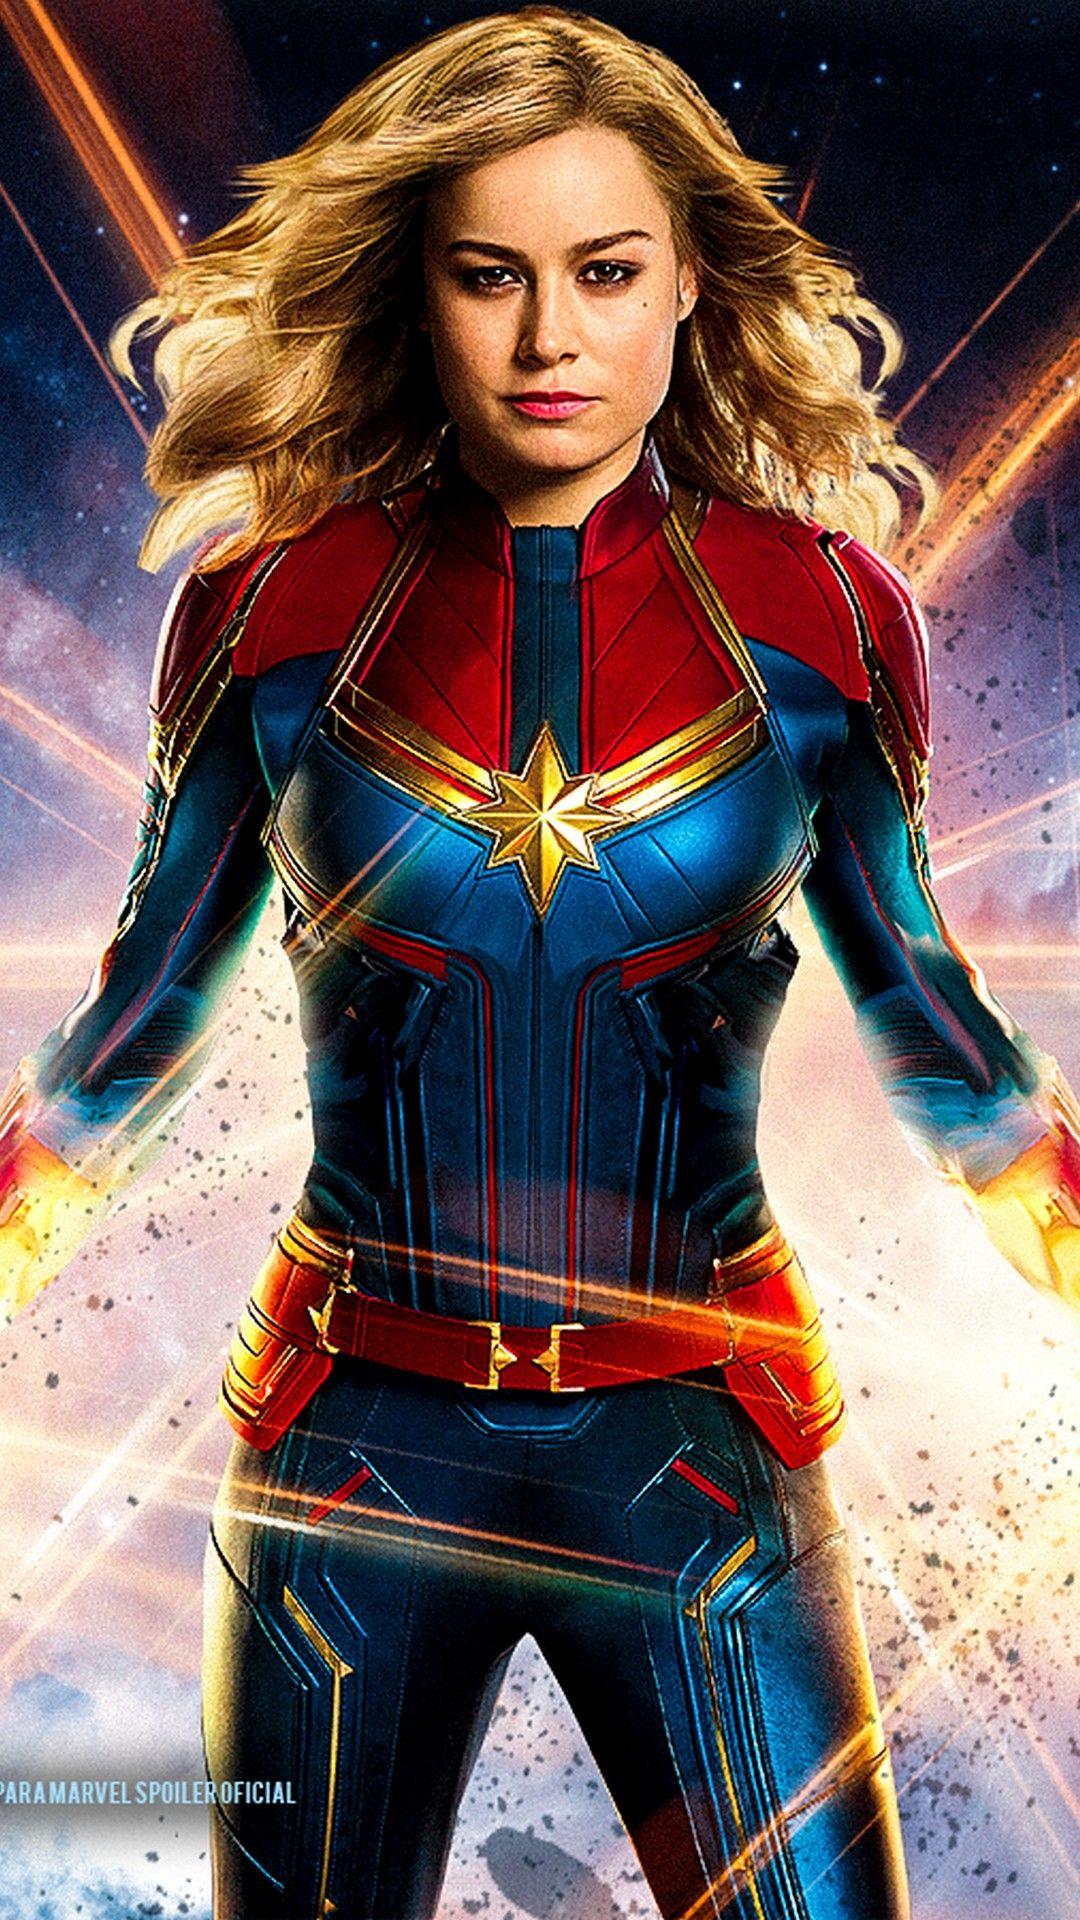 Marvel Wallpaper Download Captain Marvel Captain Marvel Carol Danvers Marvel Superheroes